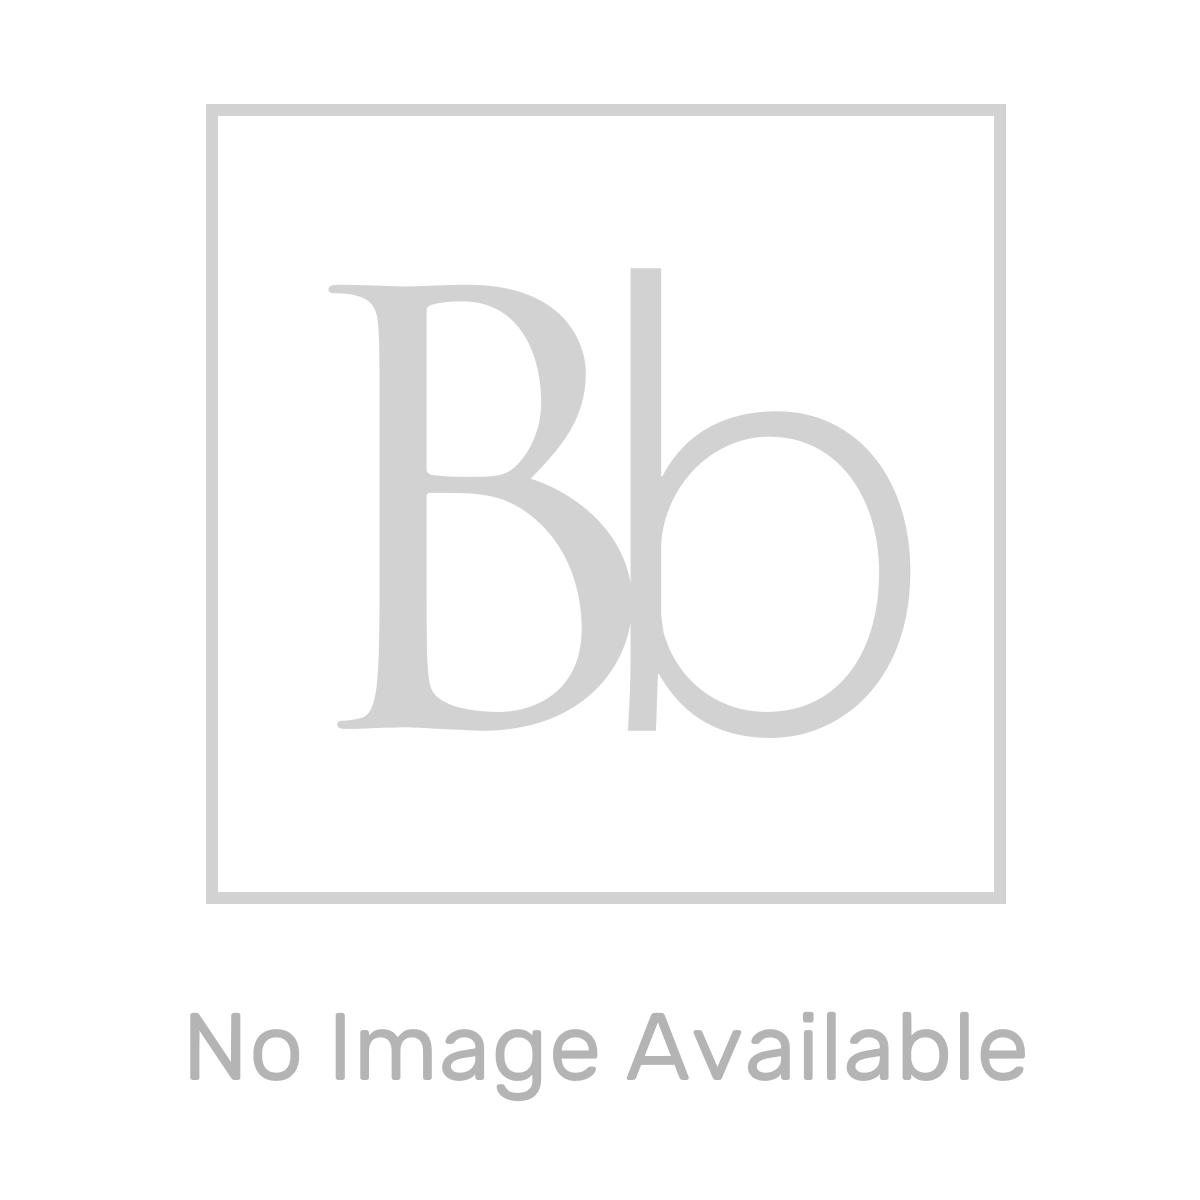 RAK Surface Greige Rustic Tile 300 x 600mm